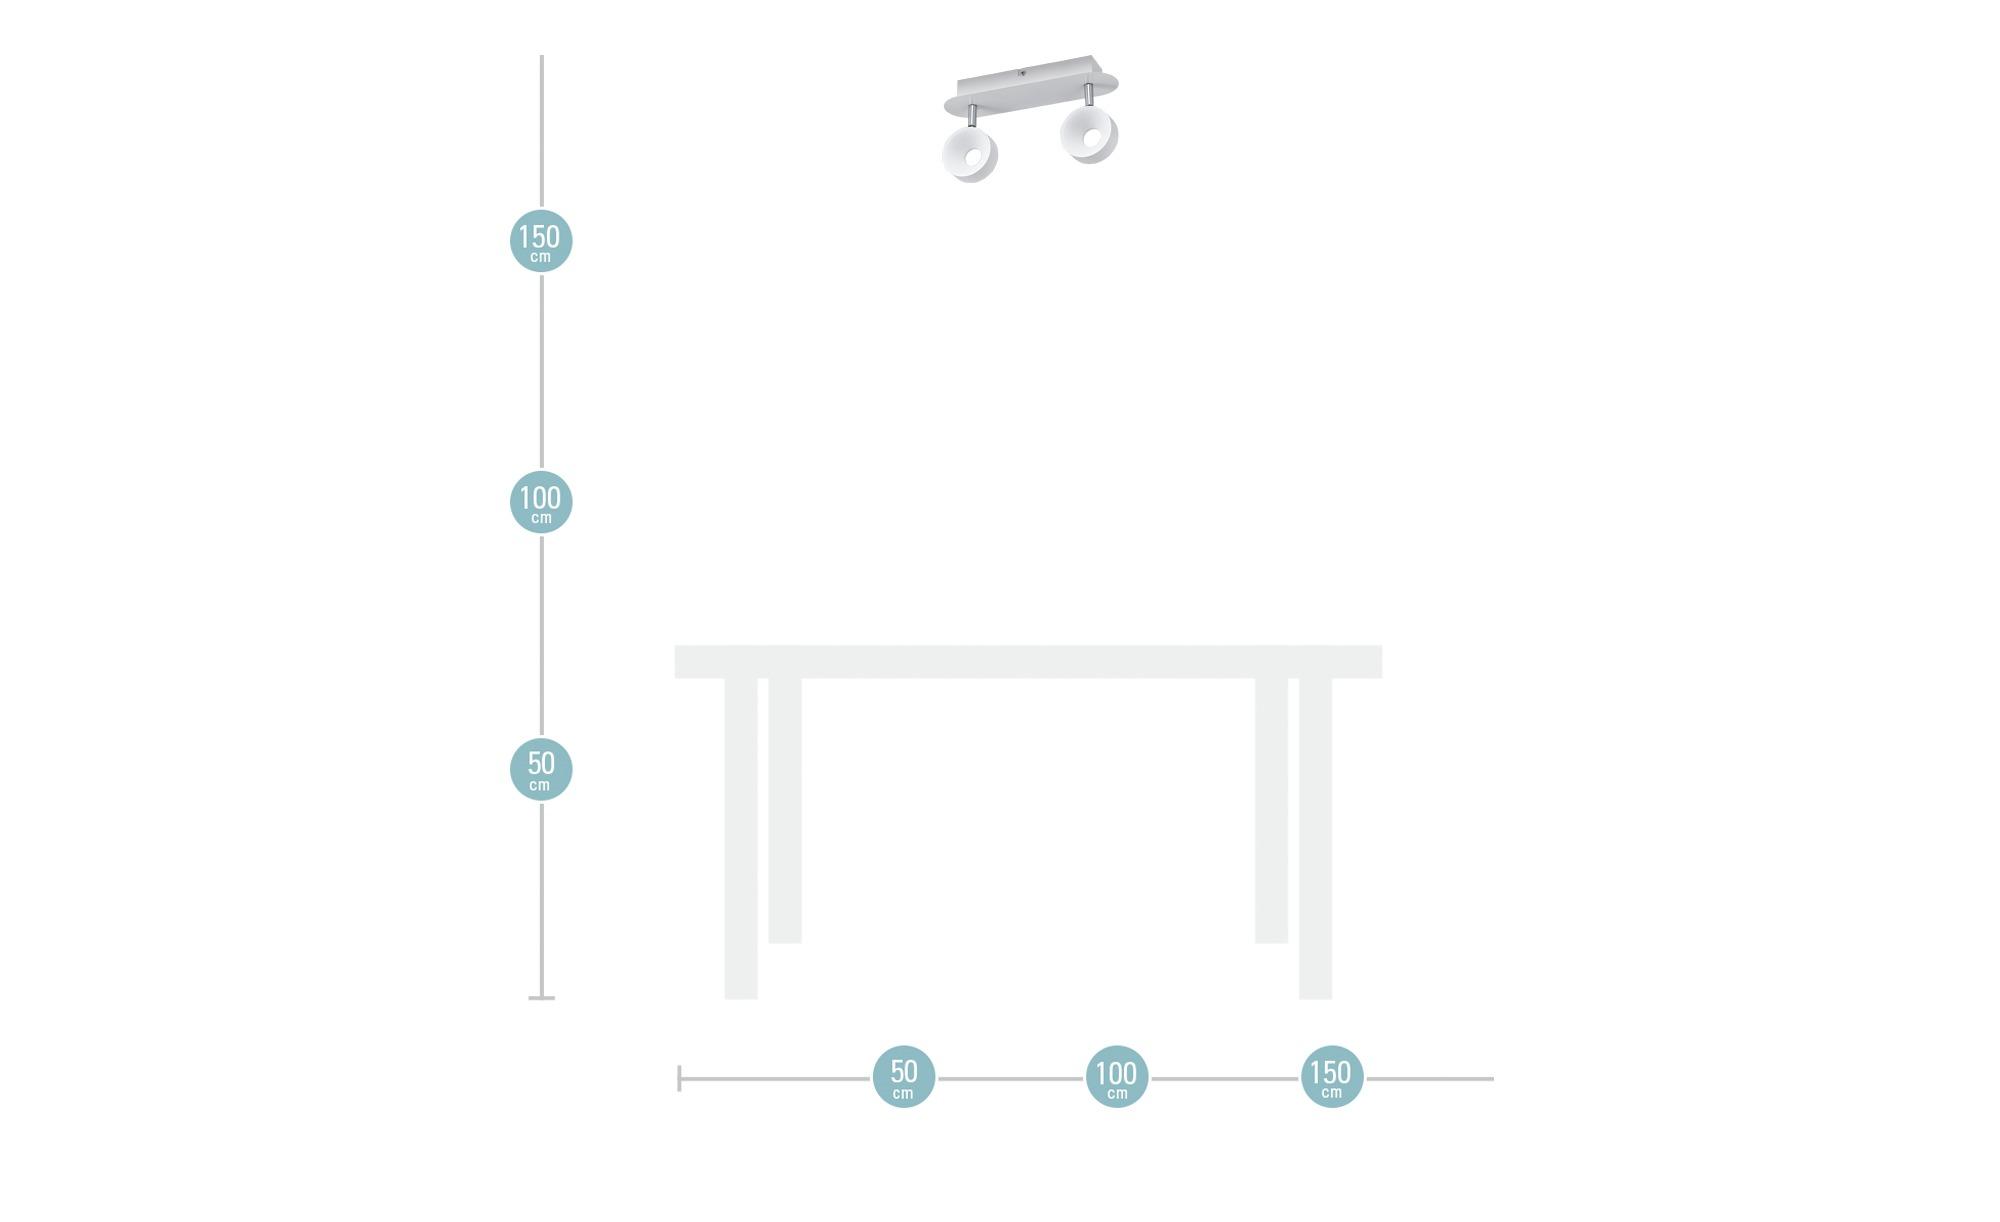 KHG LED-Spot, 2-flammig weiß ¦ weiß ¦ Maße (cm): B: 8 H: 16 Lampen & Leuchten > LED-Leuchten > LED-Strahler & Spots - Höffner